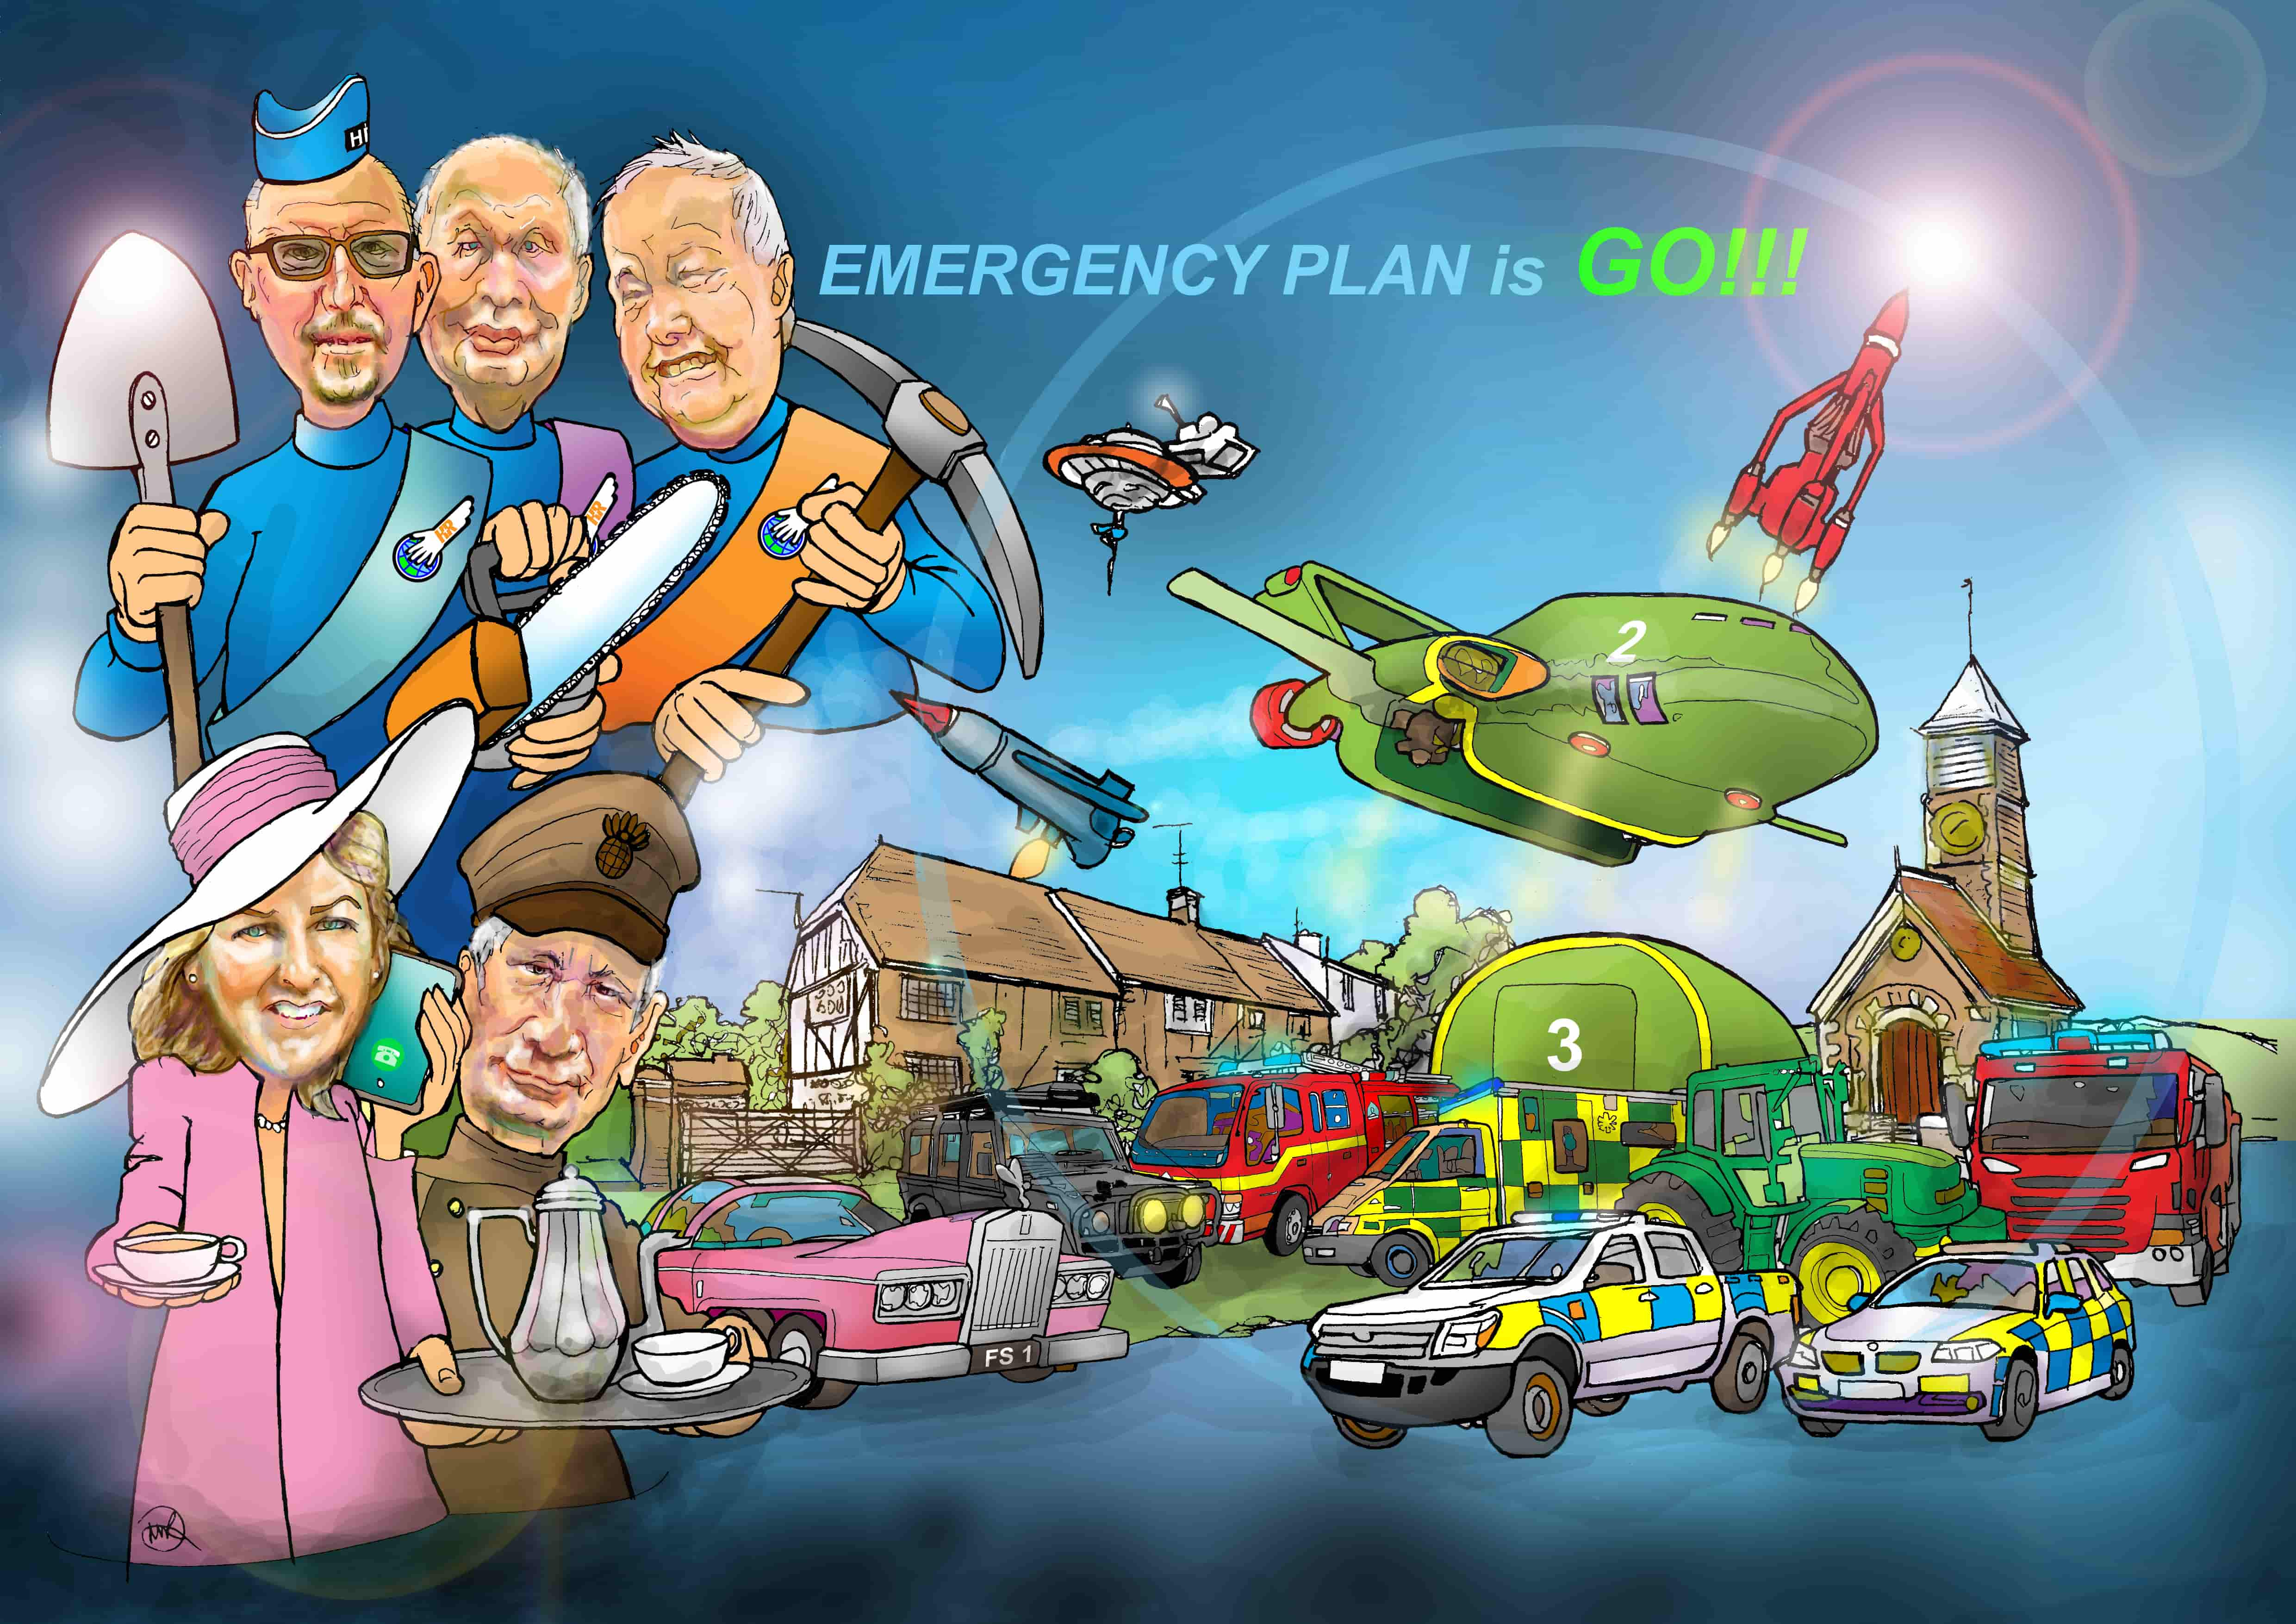 Emergency plan graphic by Martin Richardson of ARTMART